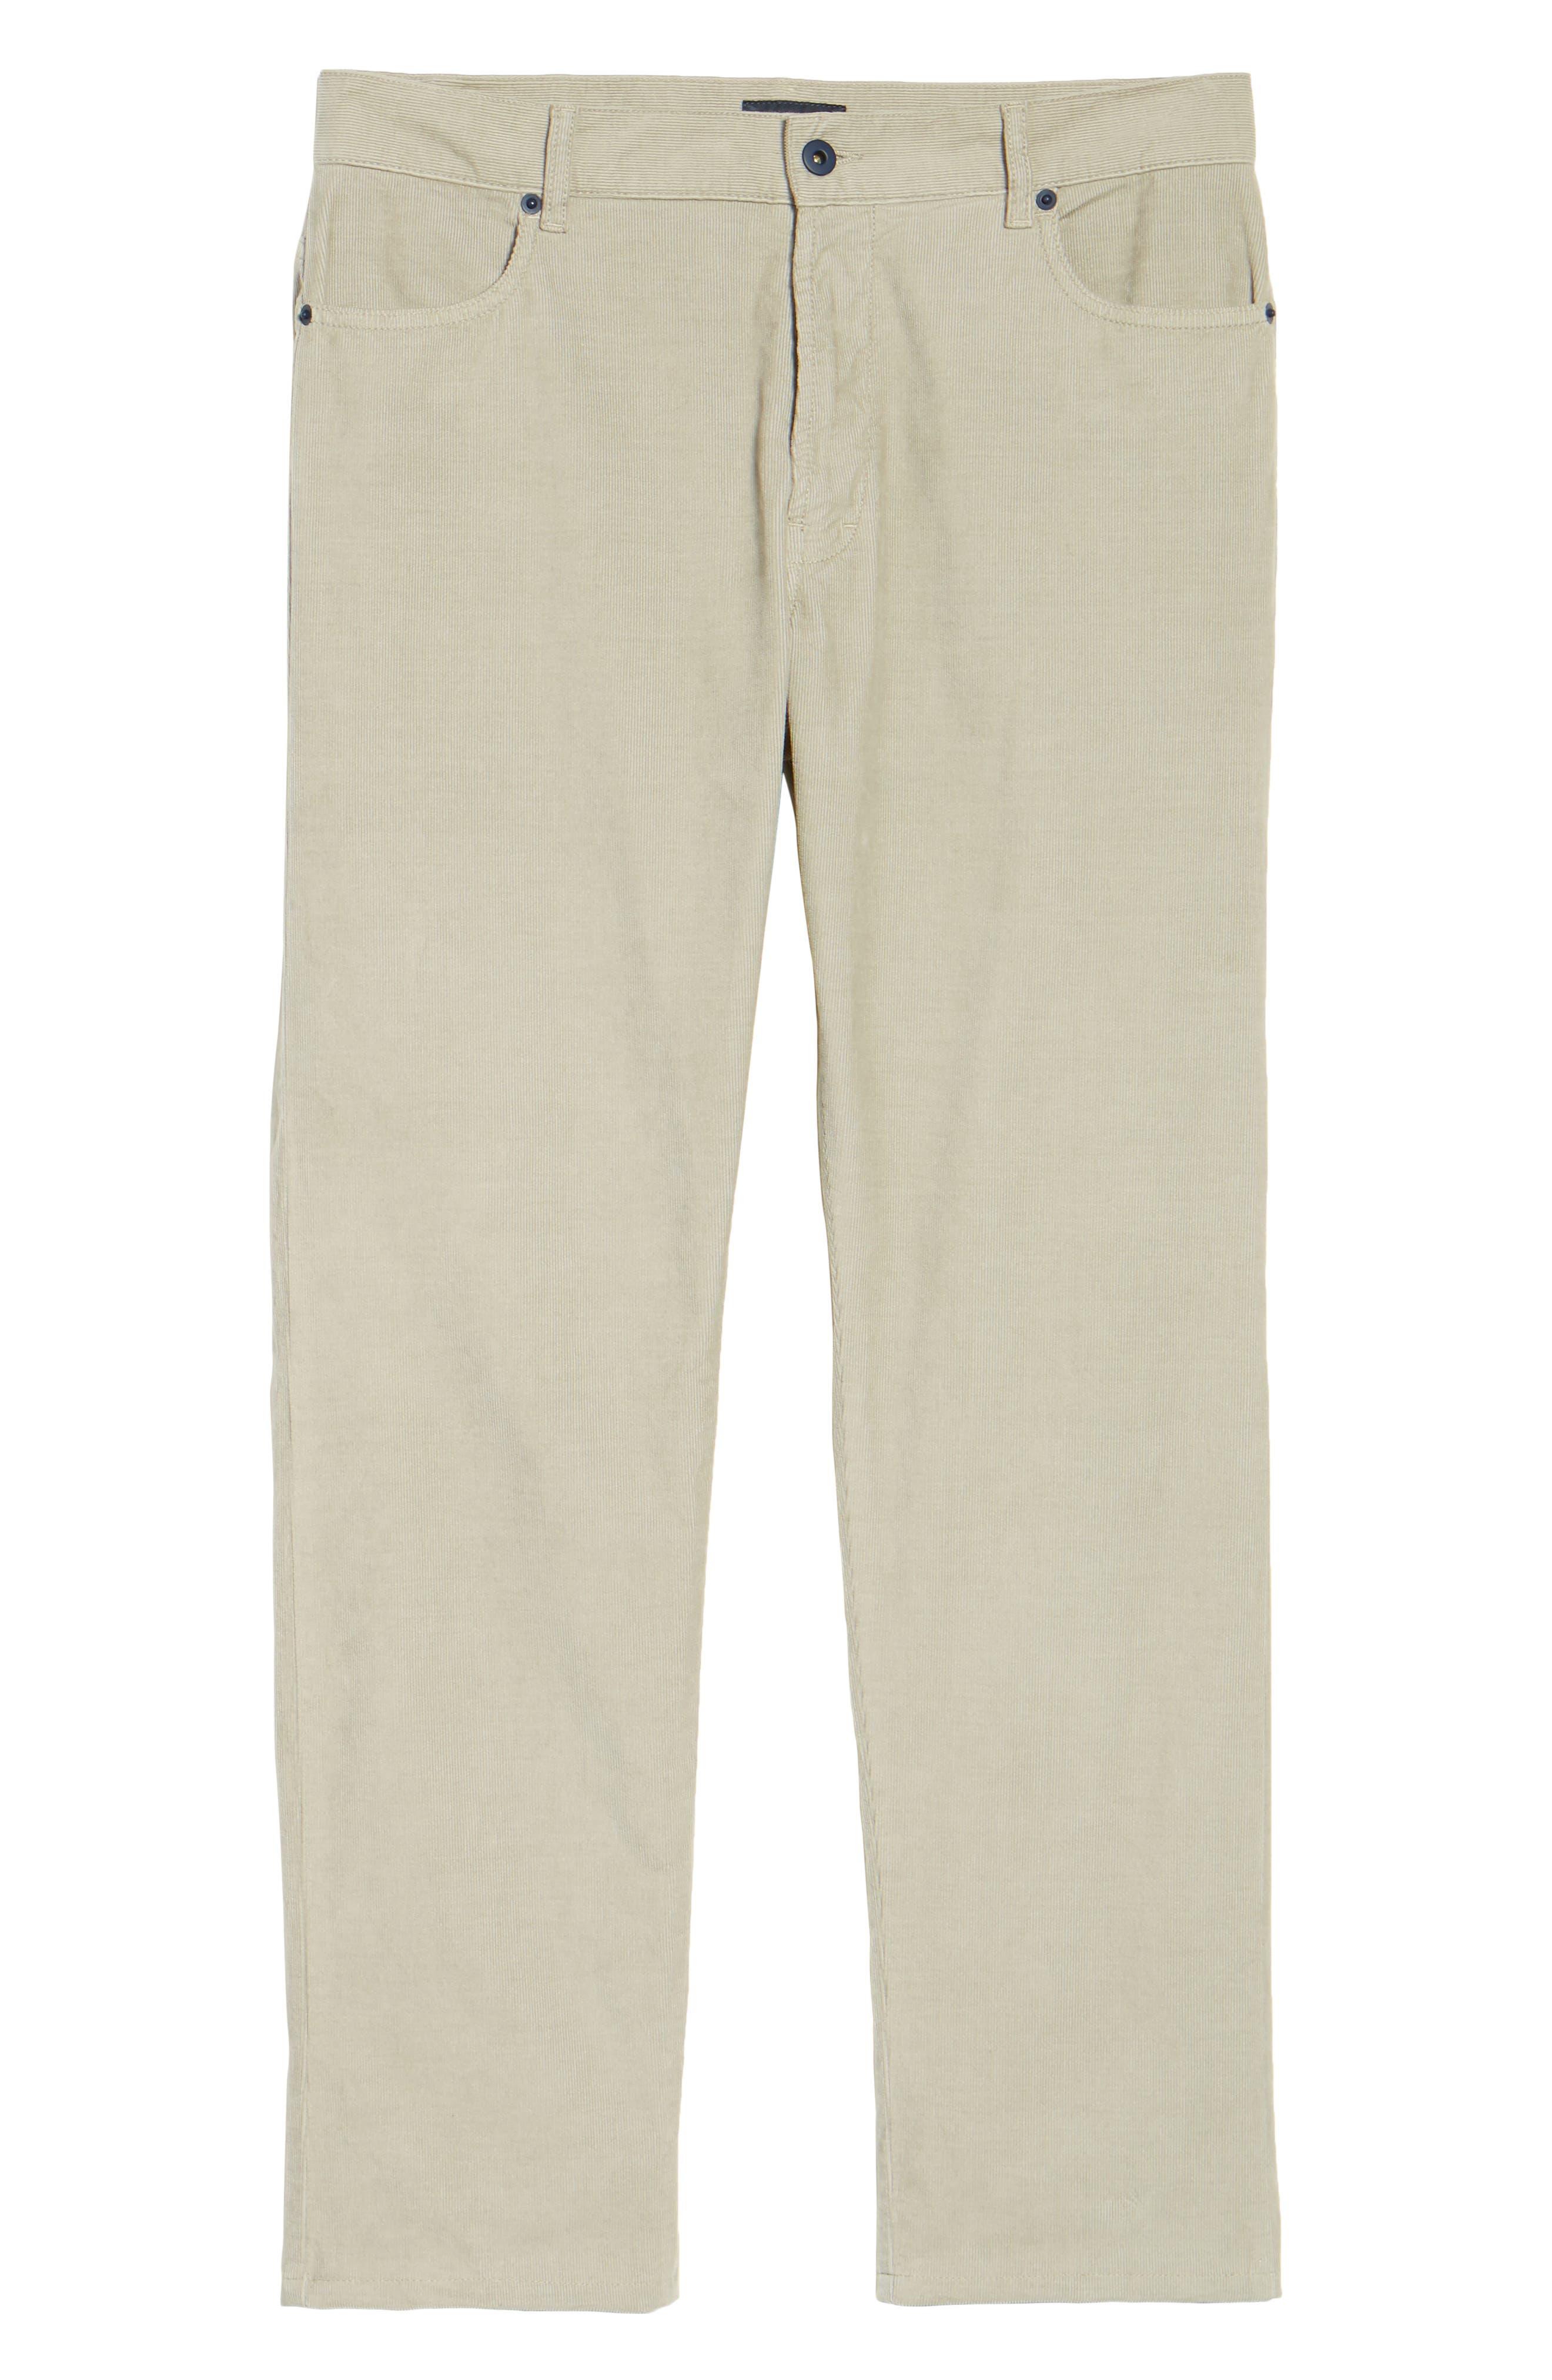 Redonda Stretch Corduroy Trousers,                             Alternate thumbnail 6, color,                             252